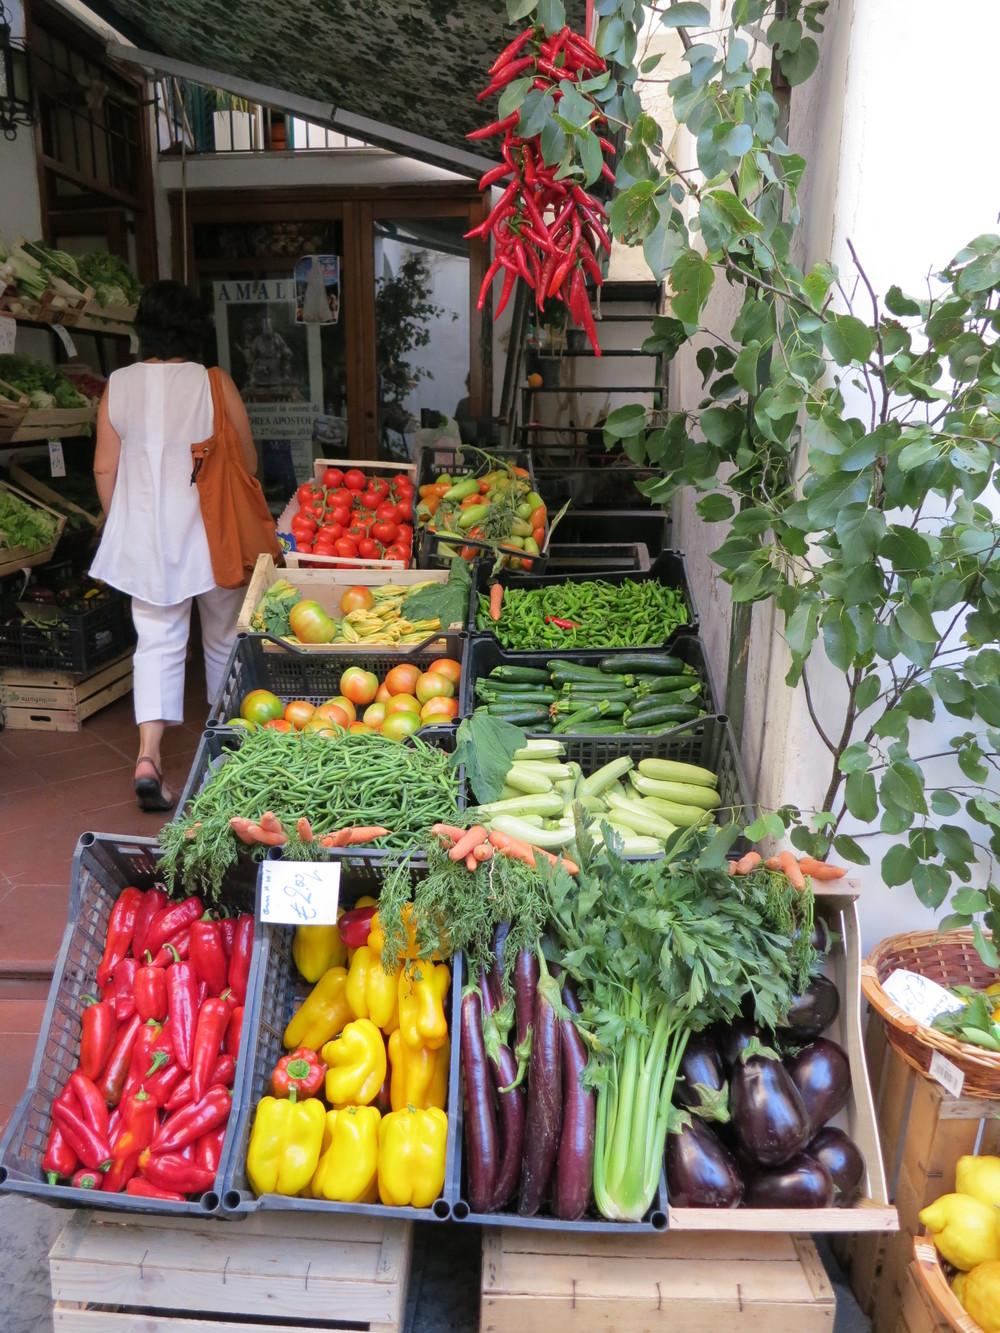 Veggie stand in Amalfi, IT (2012)